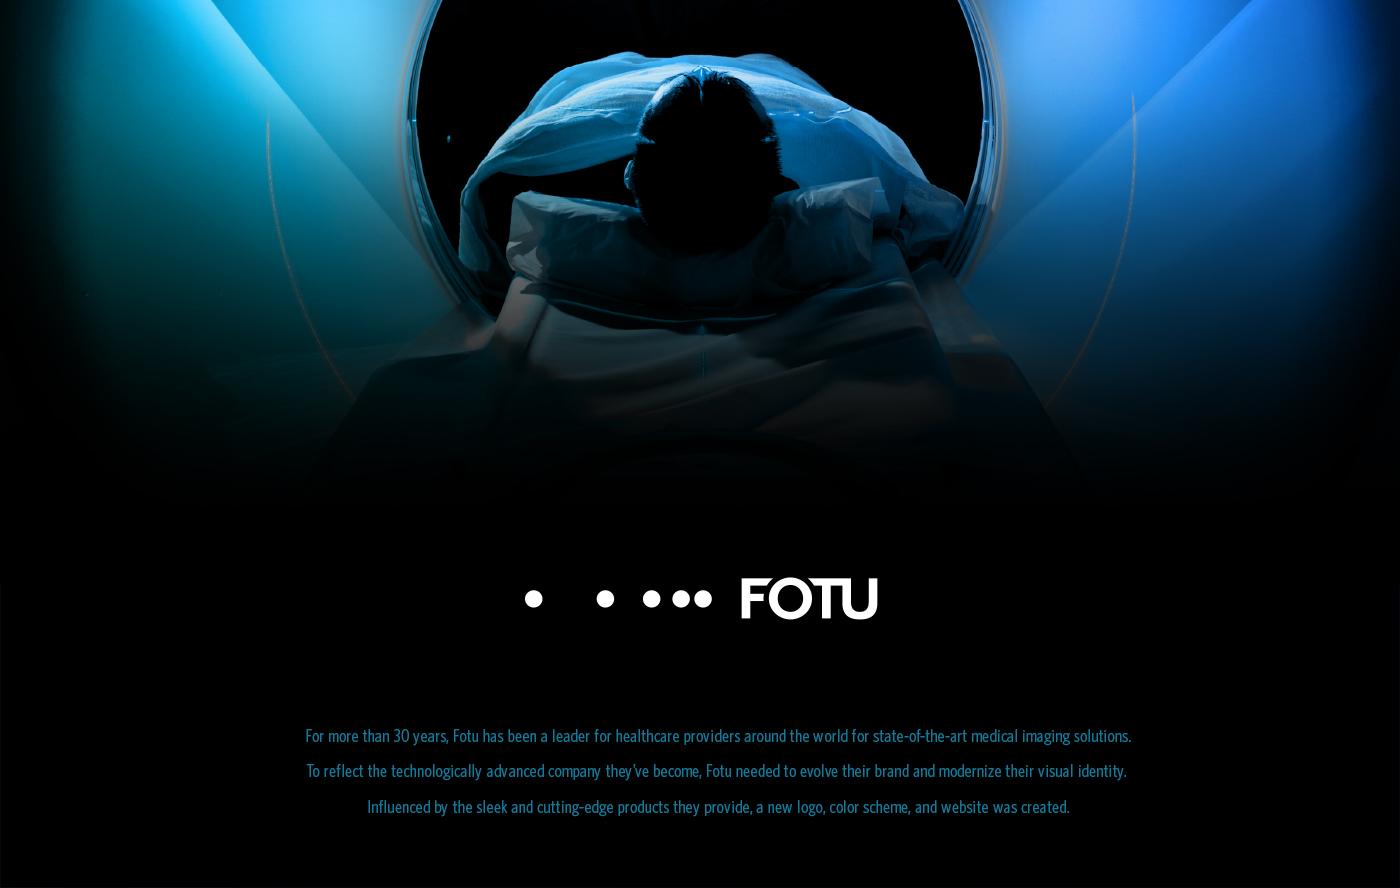 Fotu-Intro-Image.jpg